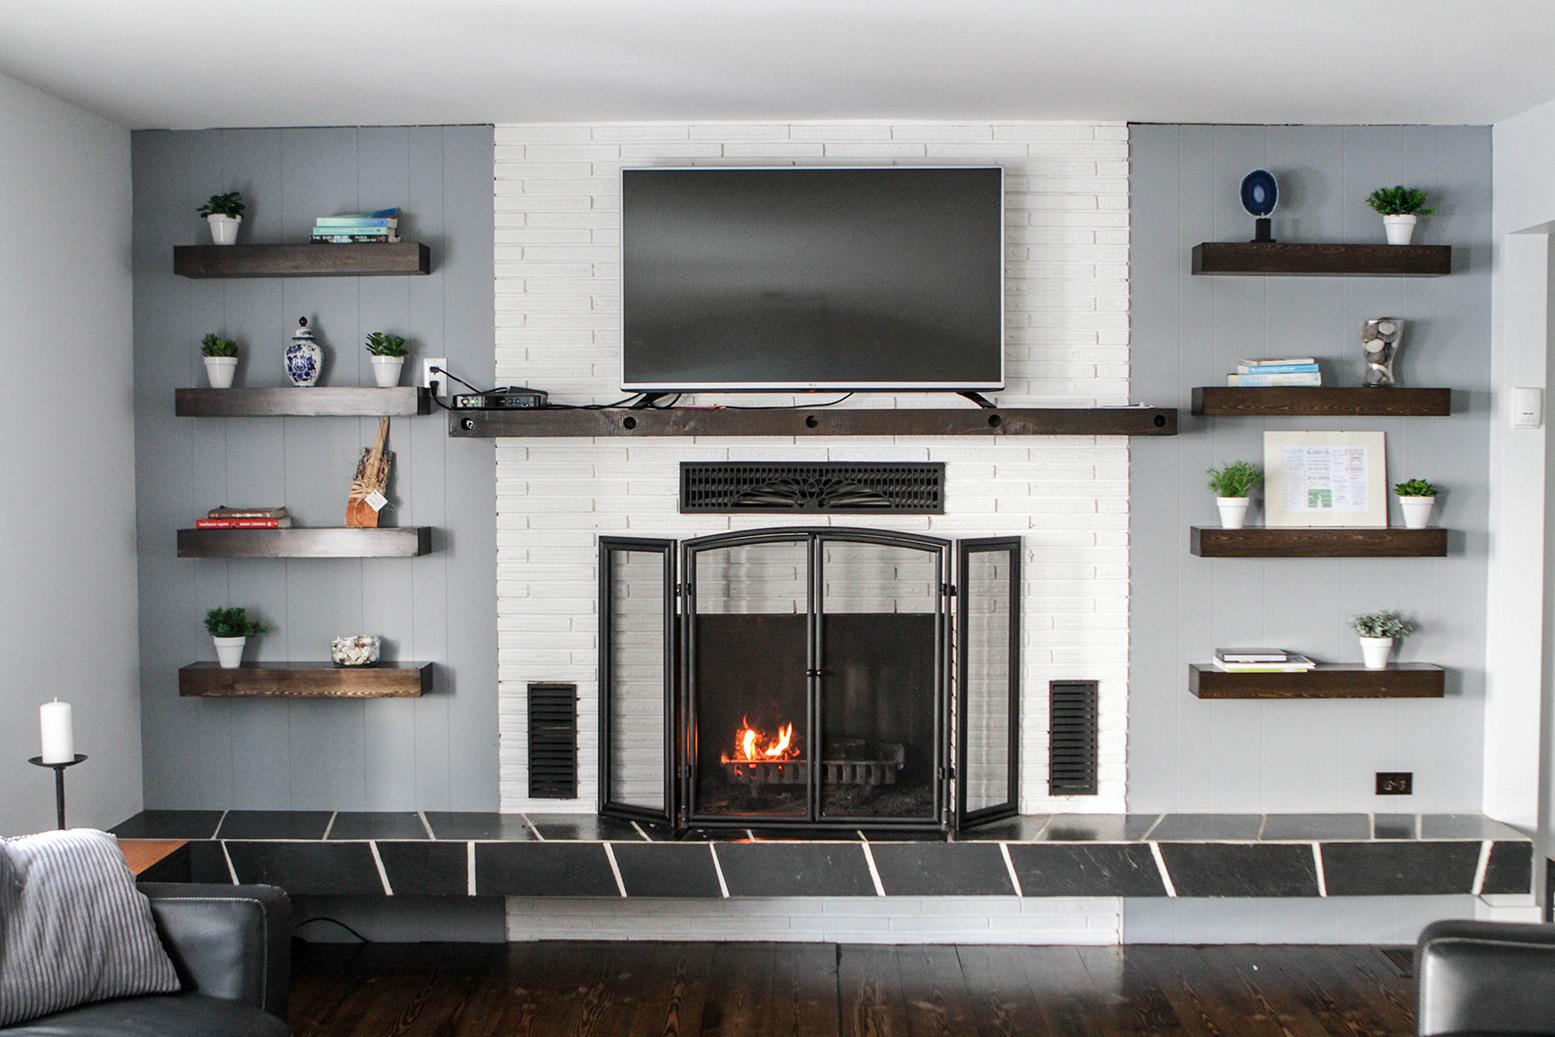 floating shelves for fireplace ideas img shelf under coat hat rack corner ture large oak marble vanity wood beam mantle small portable wall hanging hanger led victorian brackets